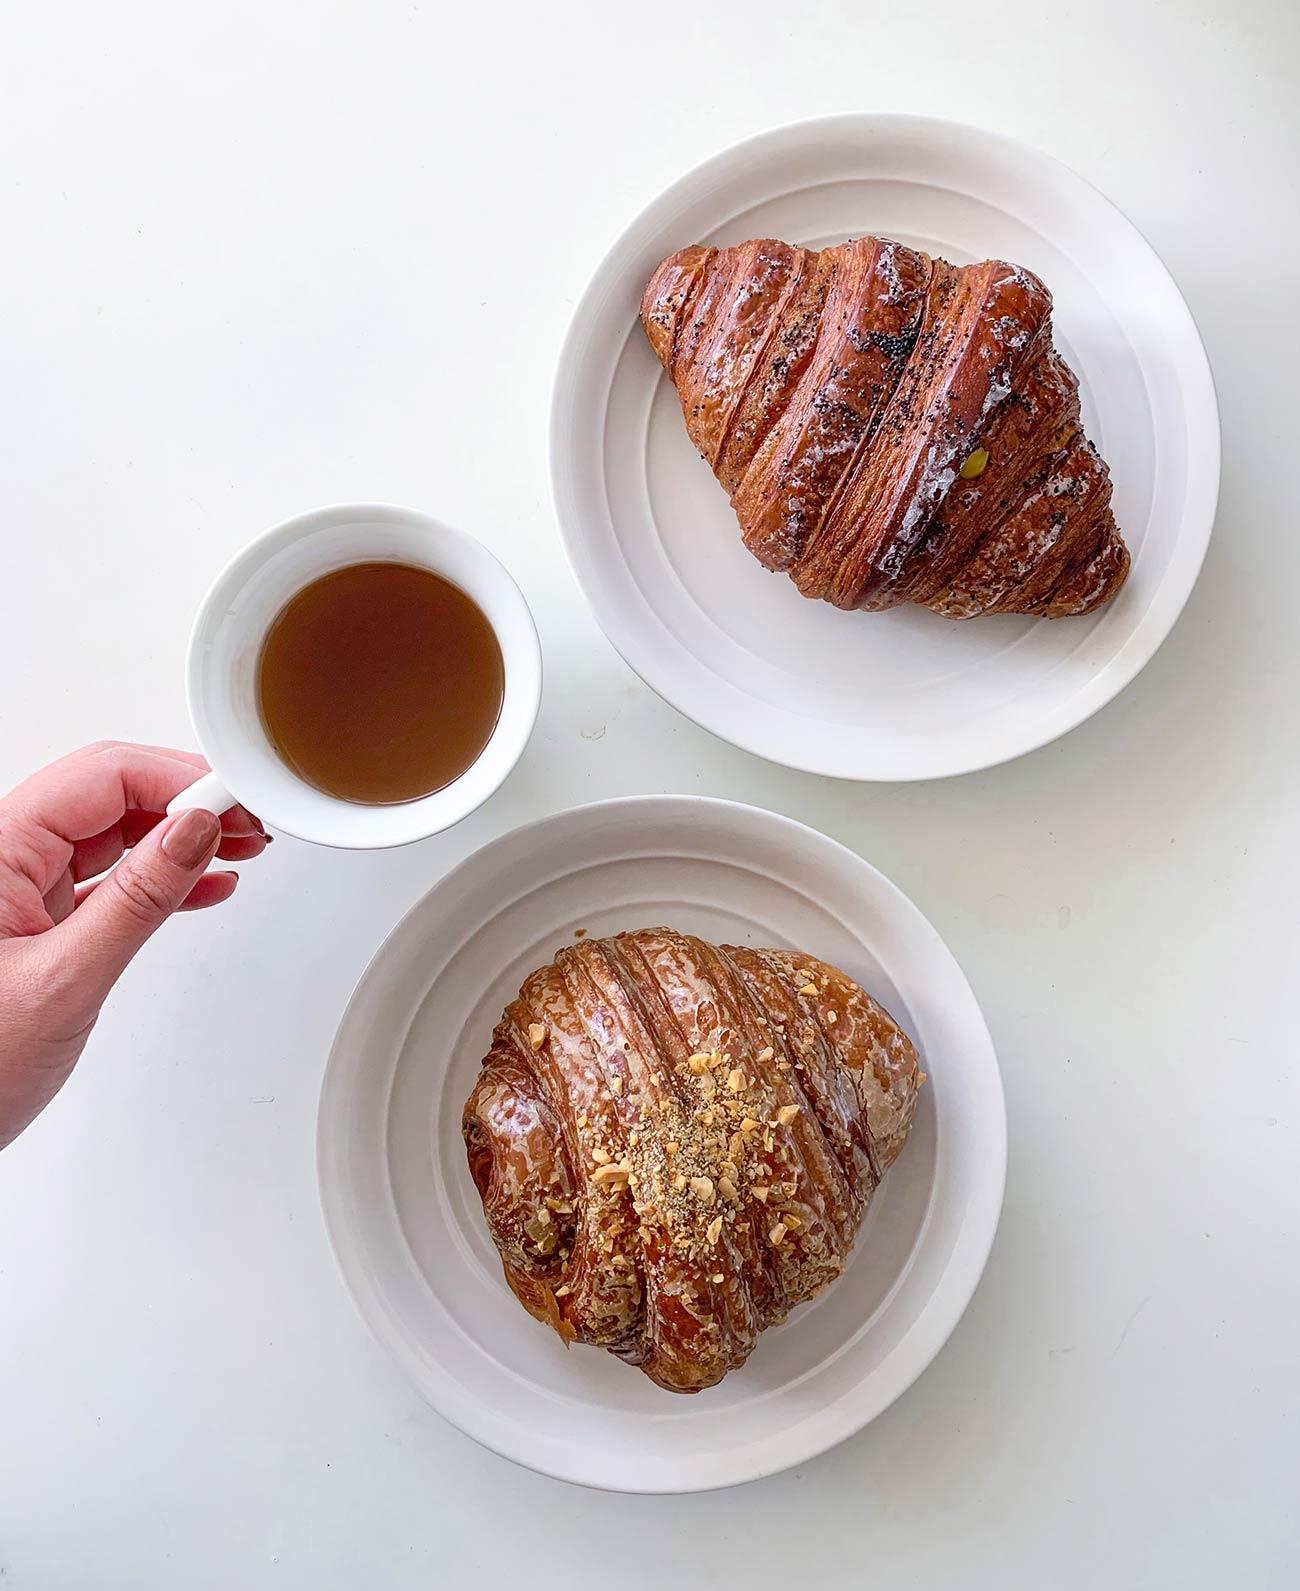 best croissants in Toronto - Le Beau